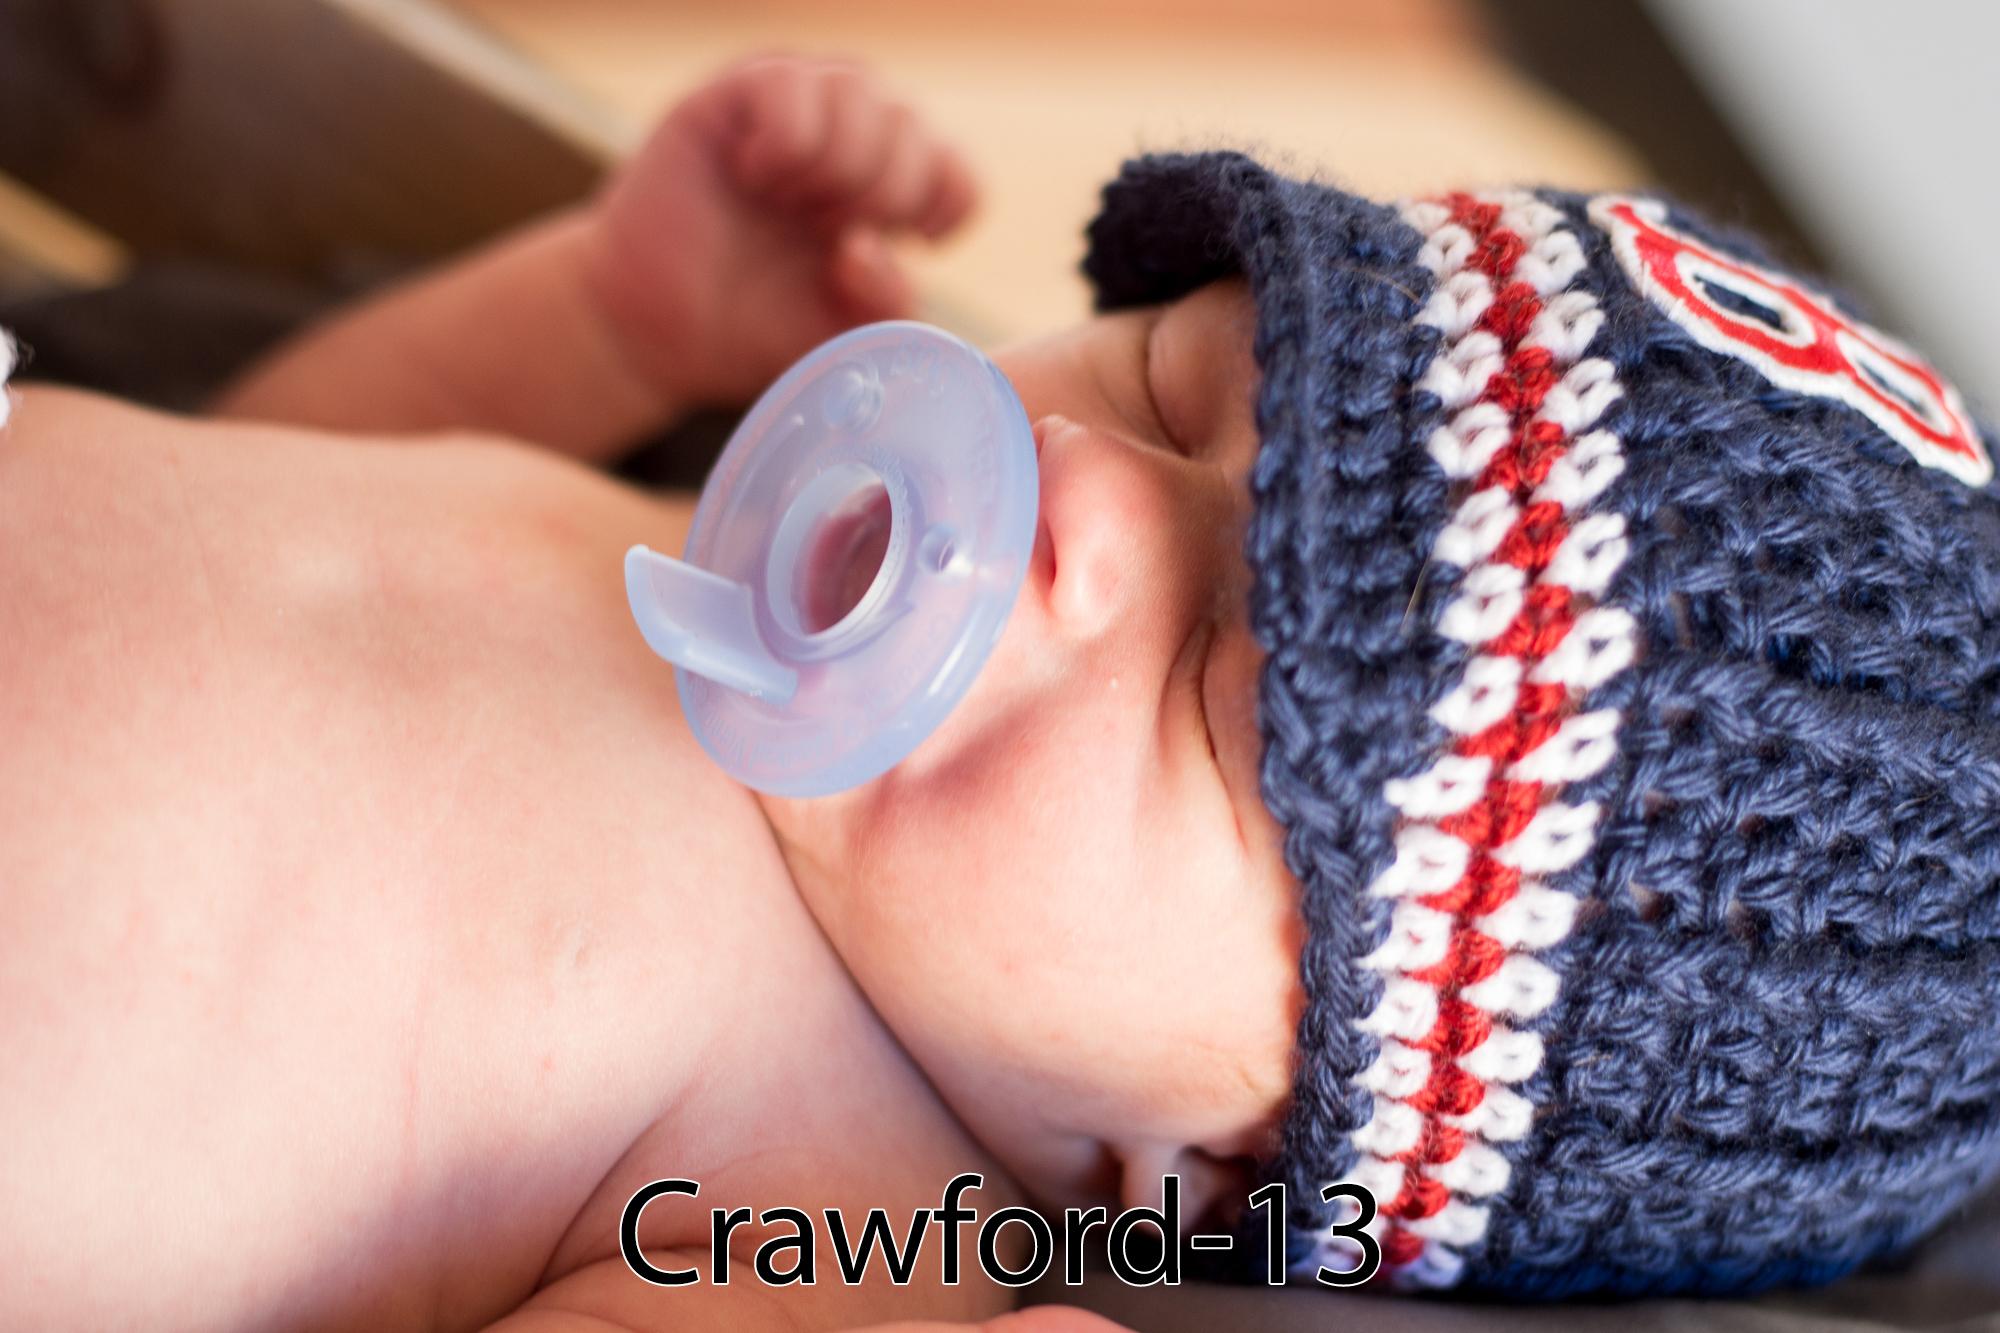 Crawford-13.jpg